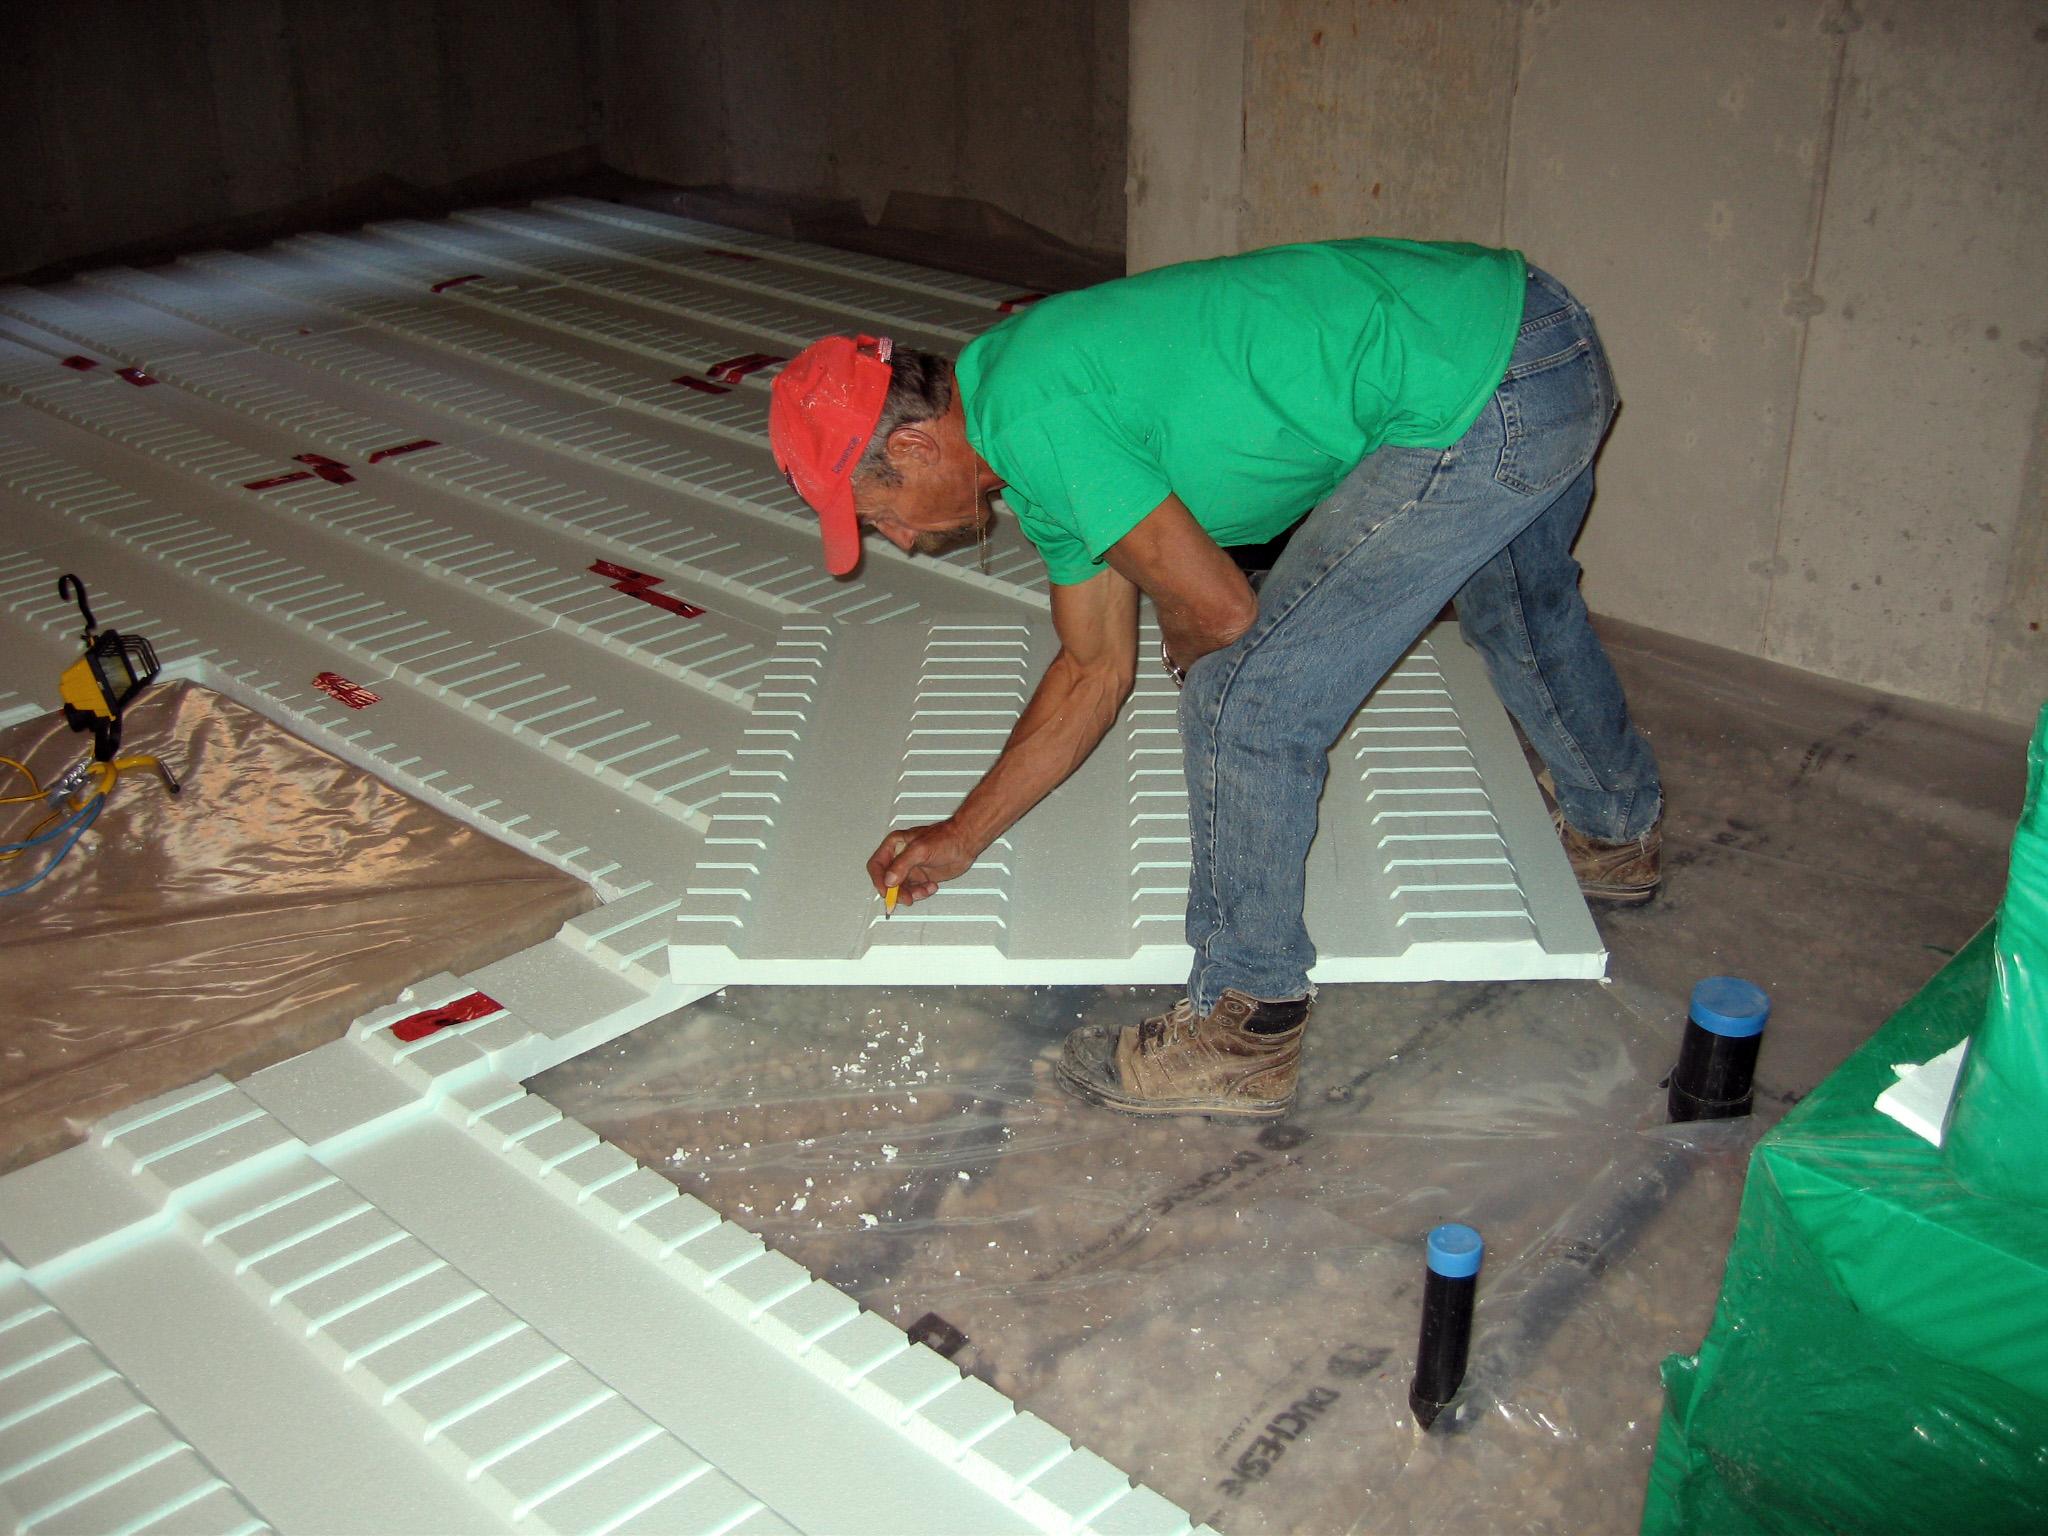 Plastispan Hd Hydronic Insulation For Radiant Floor